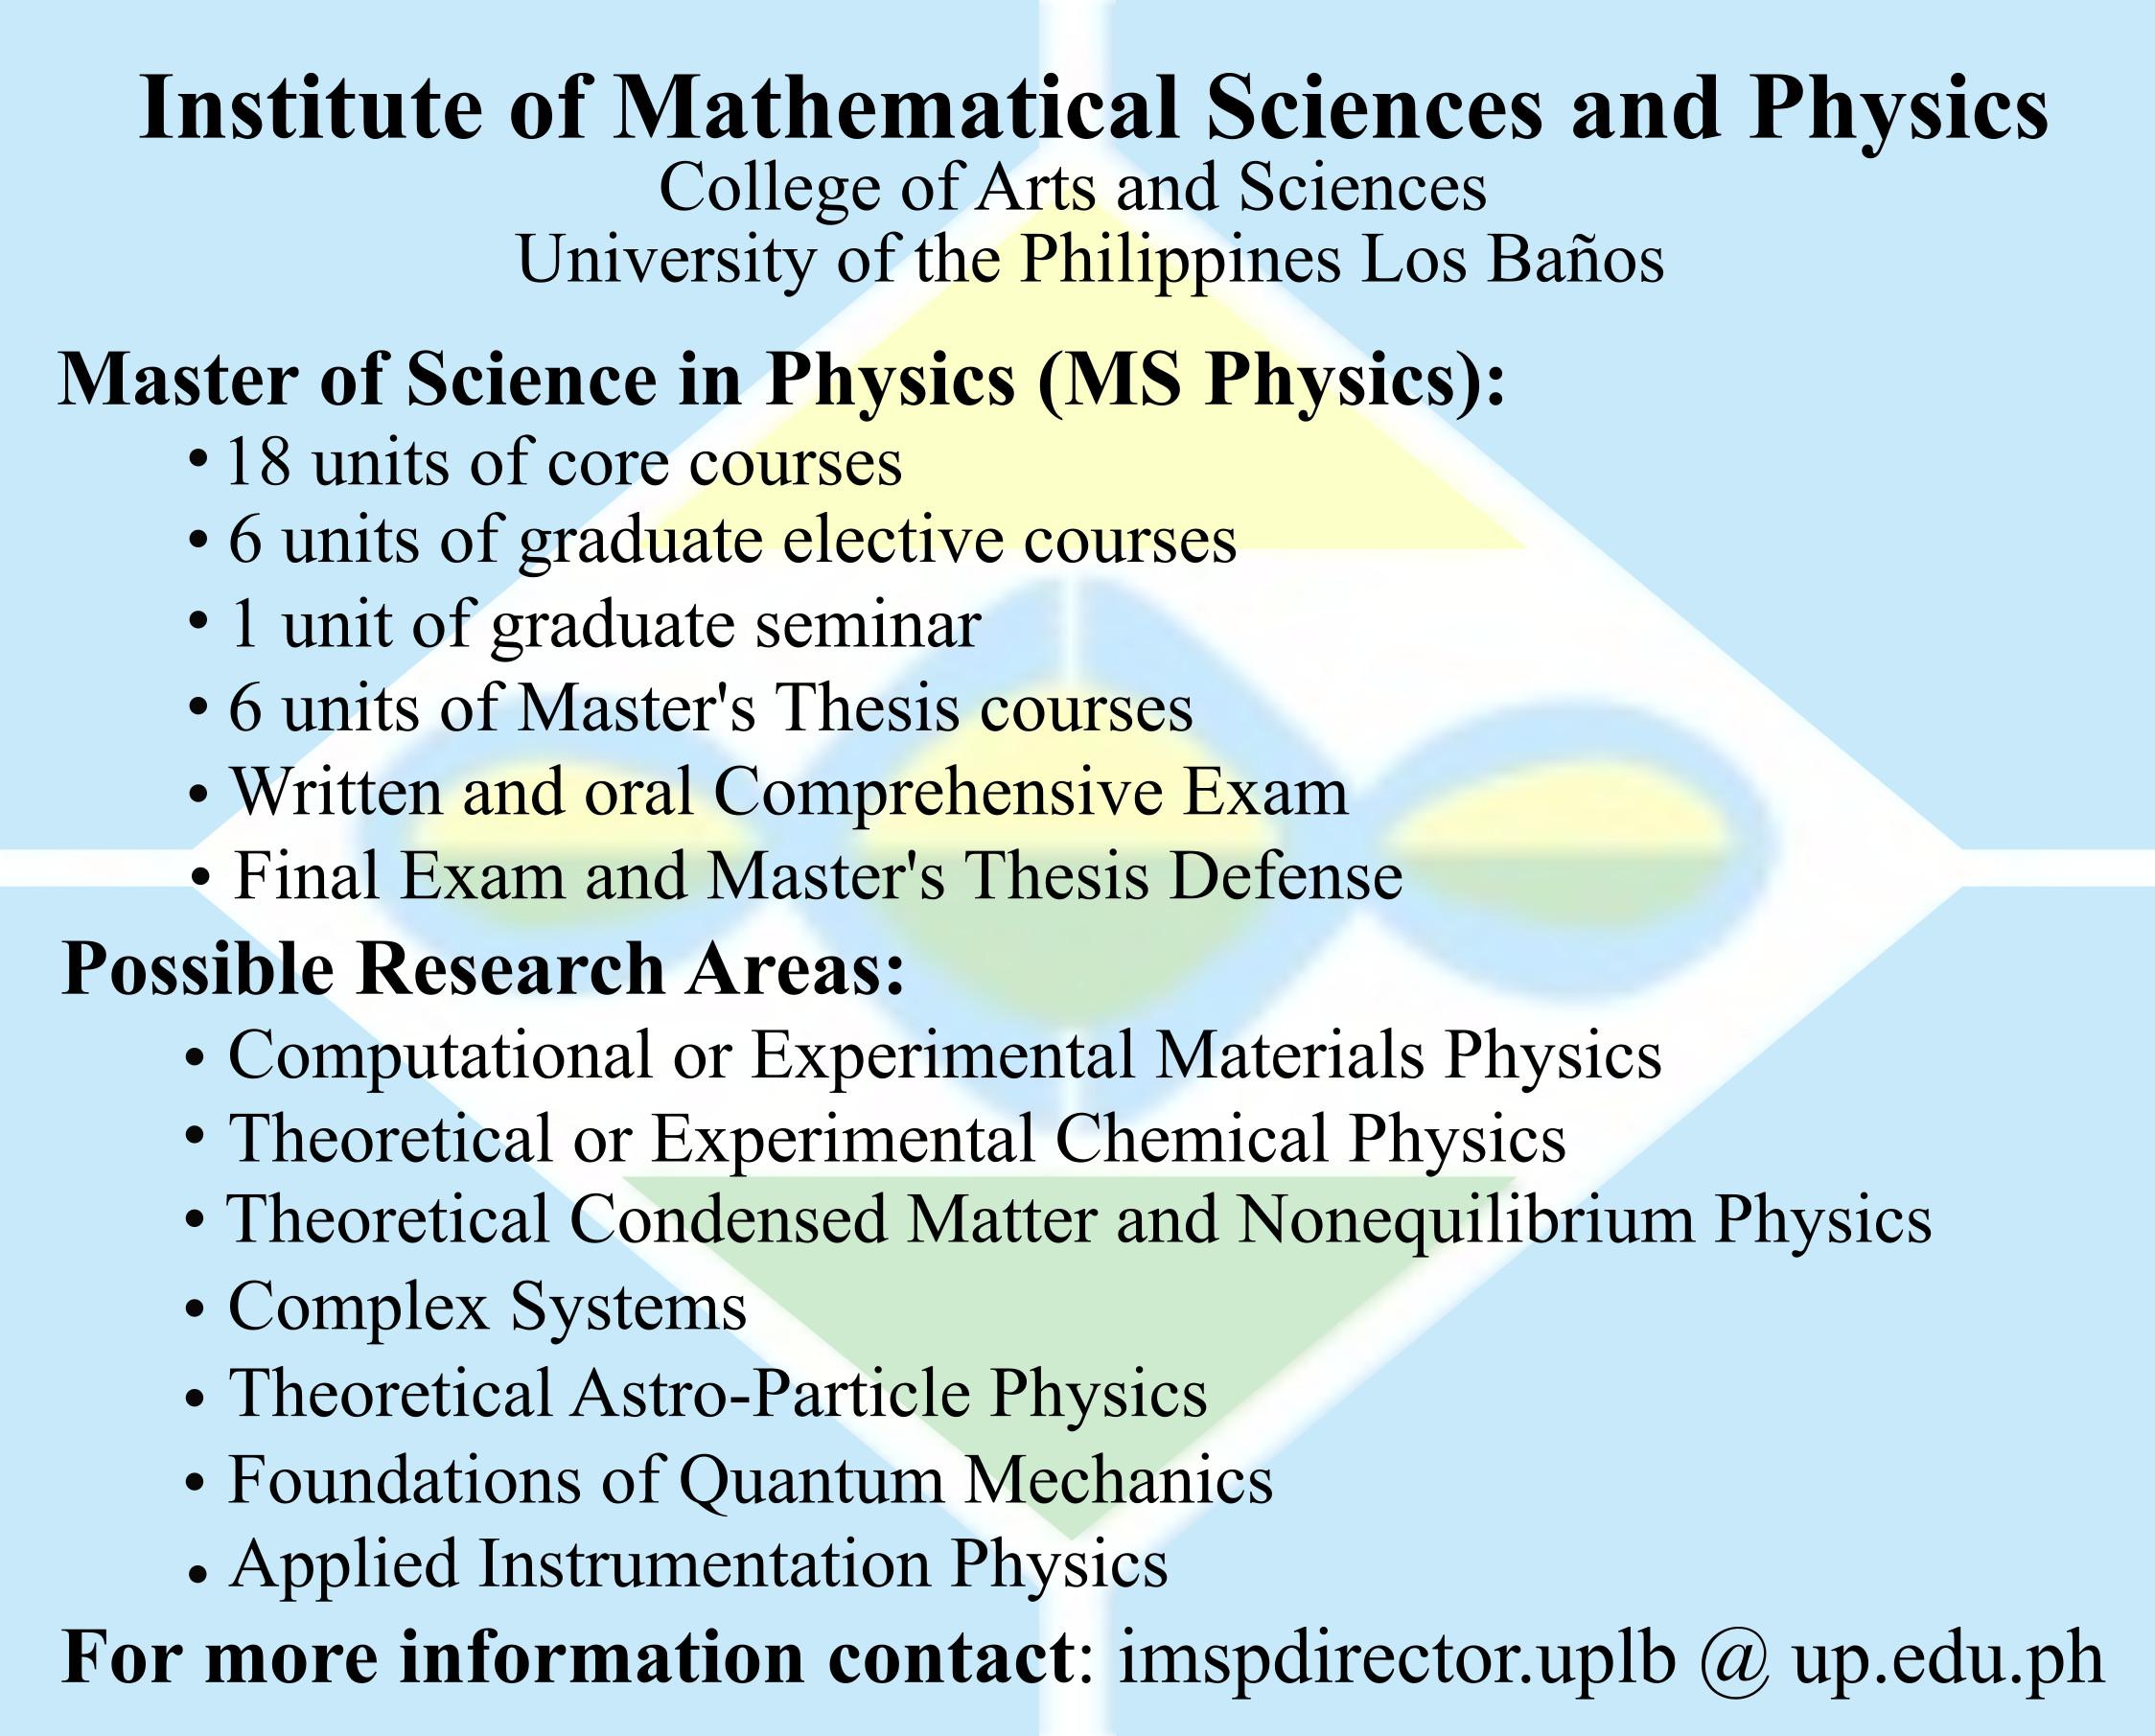 IMSP_MSPhysics